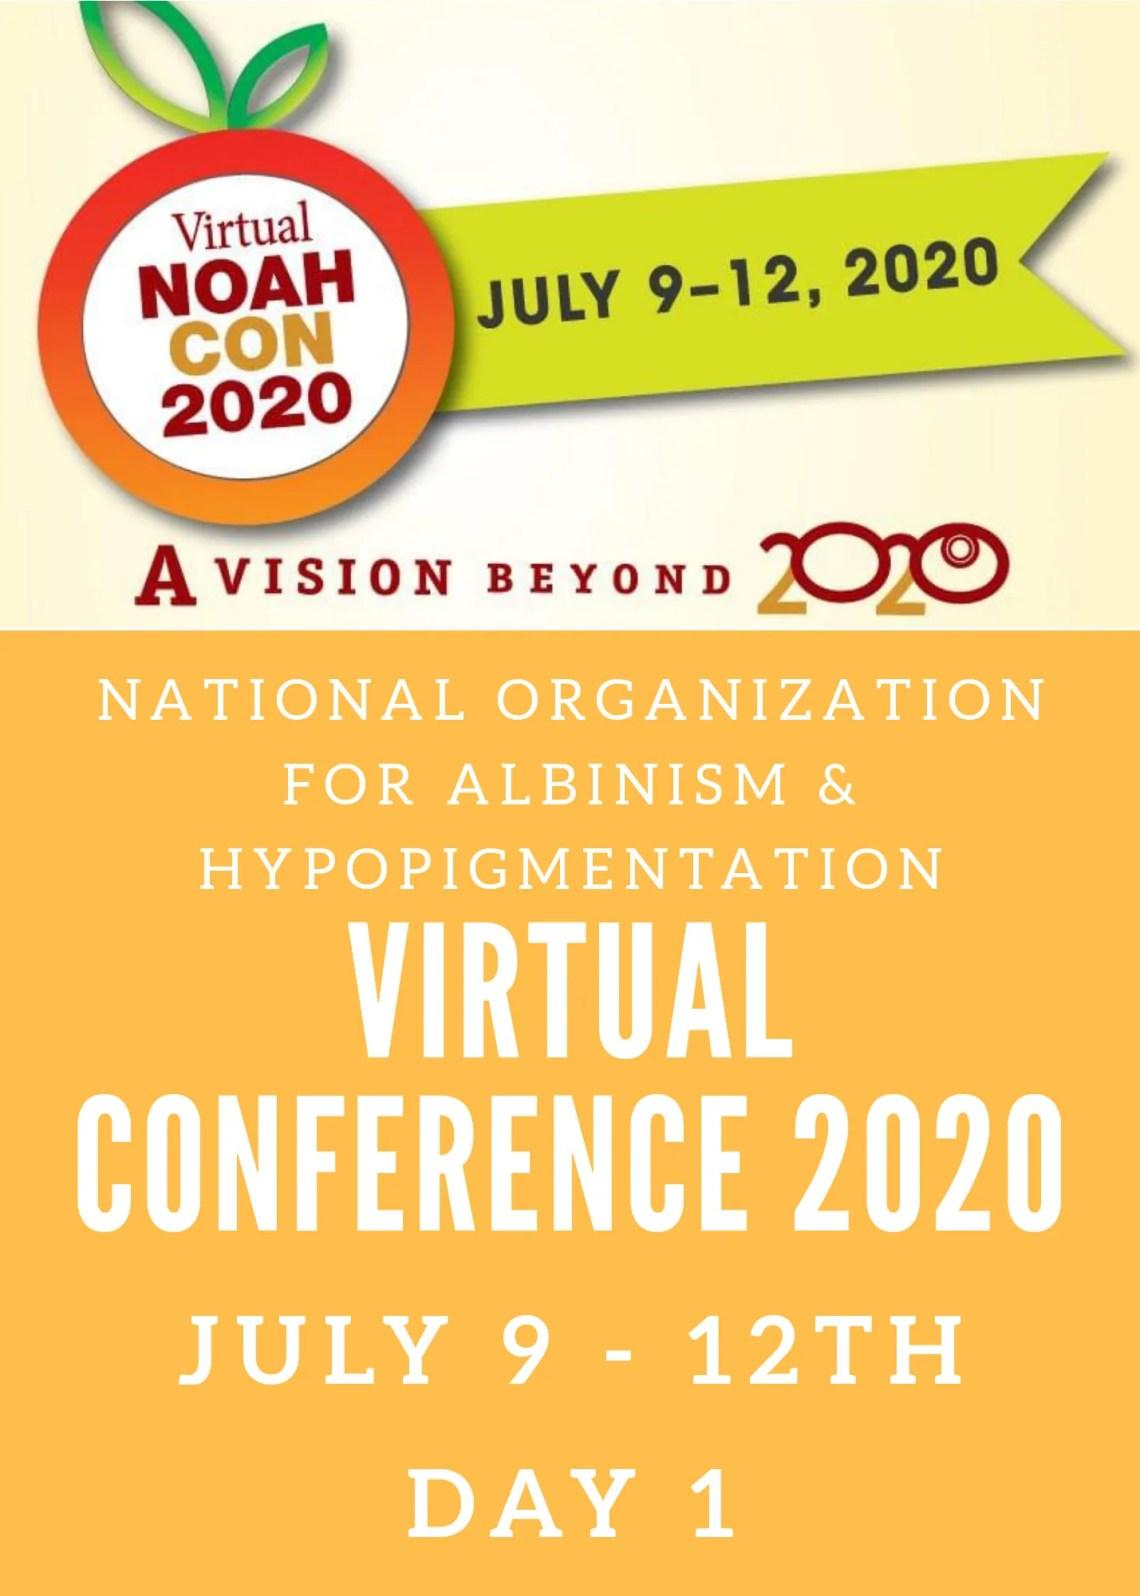 NOAH Virtual Conference Day 1